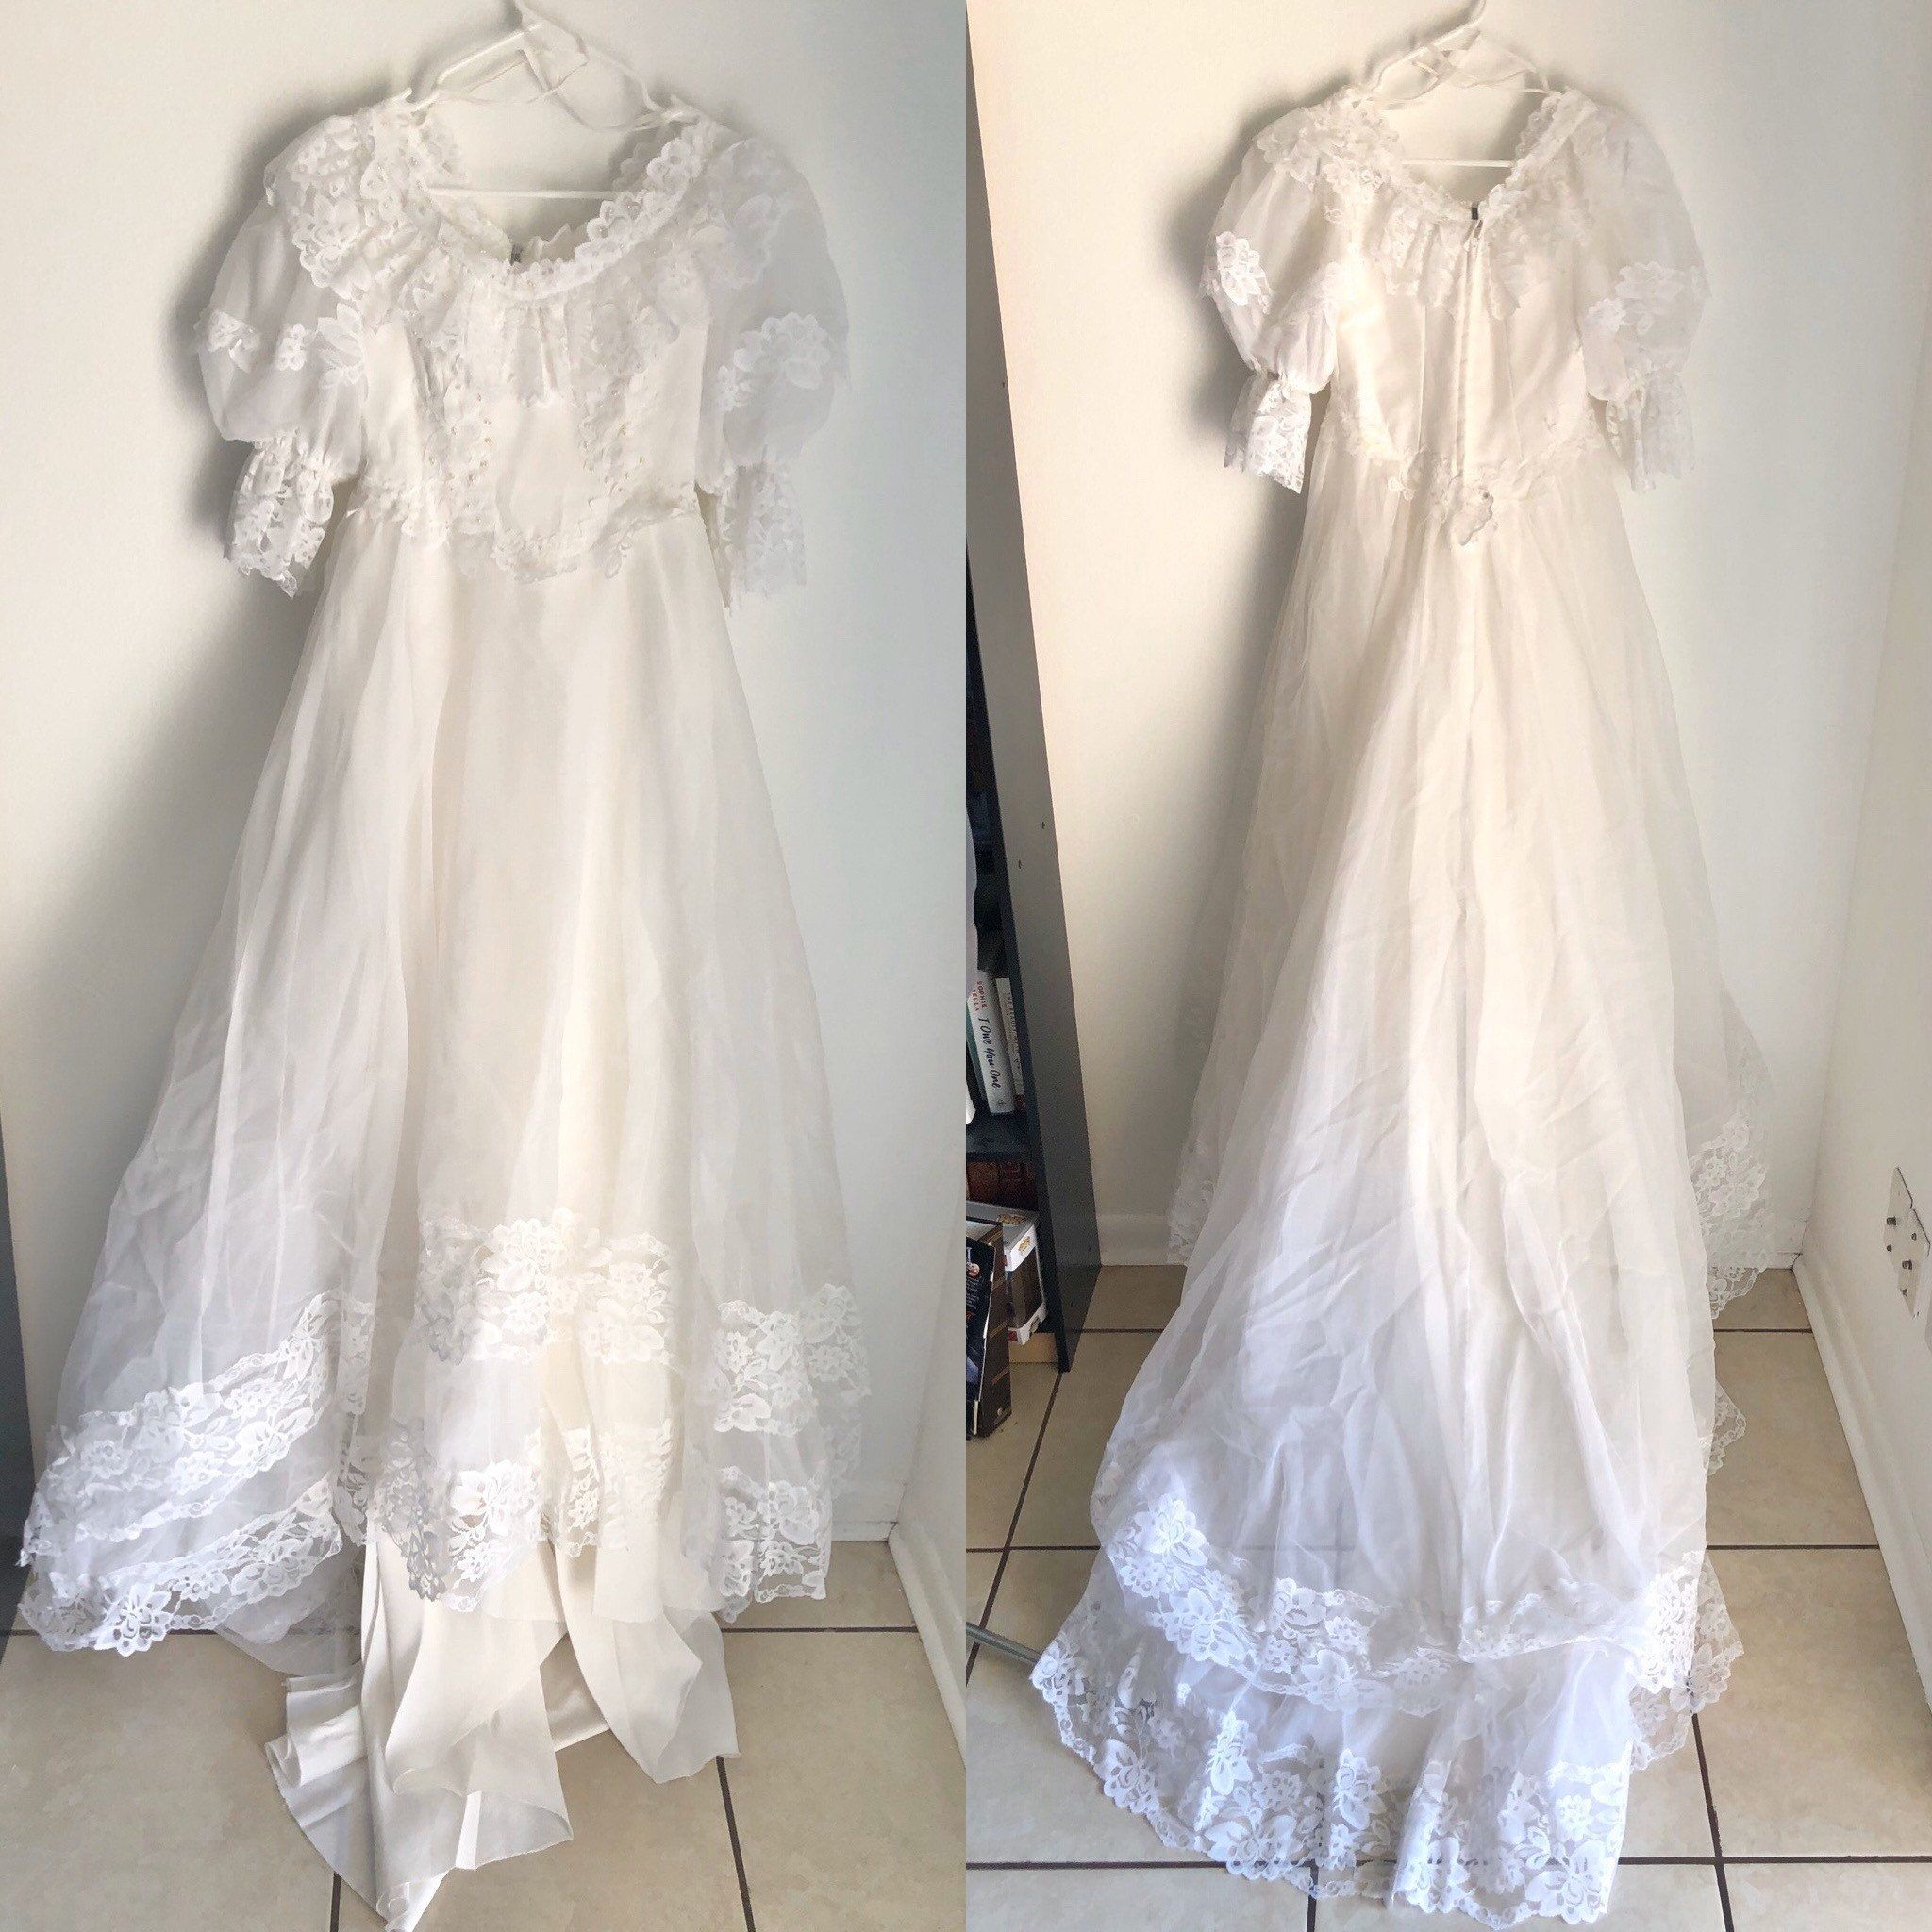 Vintage 80s 90s Jcpenney Southern Belle Style Wedding Dress Size 7 8 Organza Taffeta Lace Tra Wedding Dress Sizes Vintage Dresses Flower Girl Dresses [ 2048 x 2048 Pixel ]